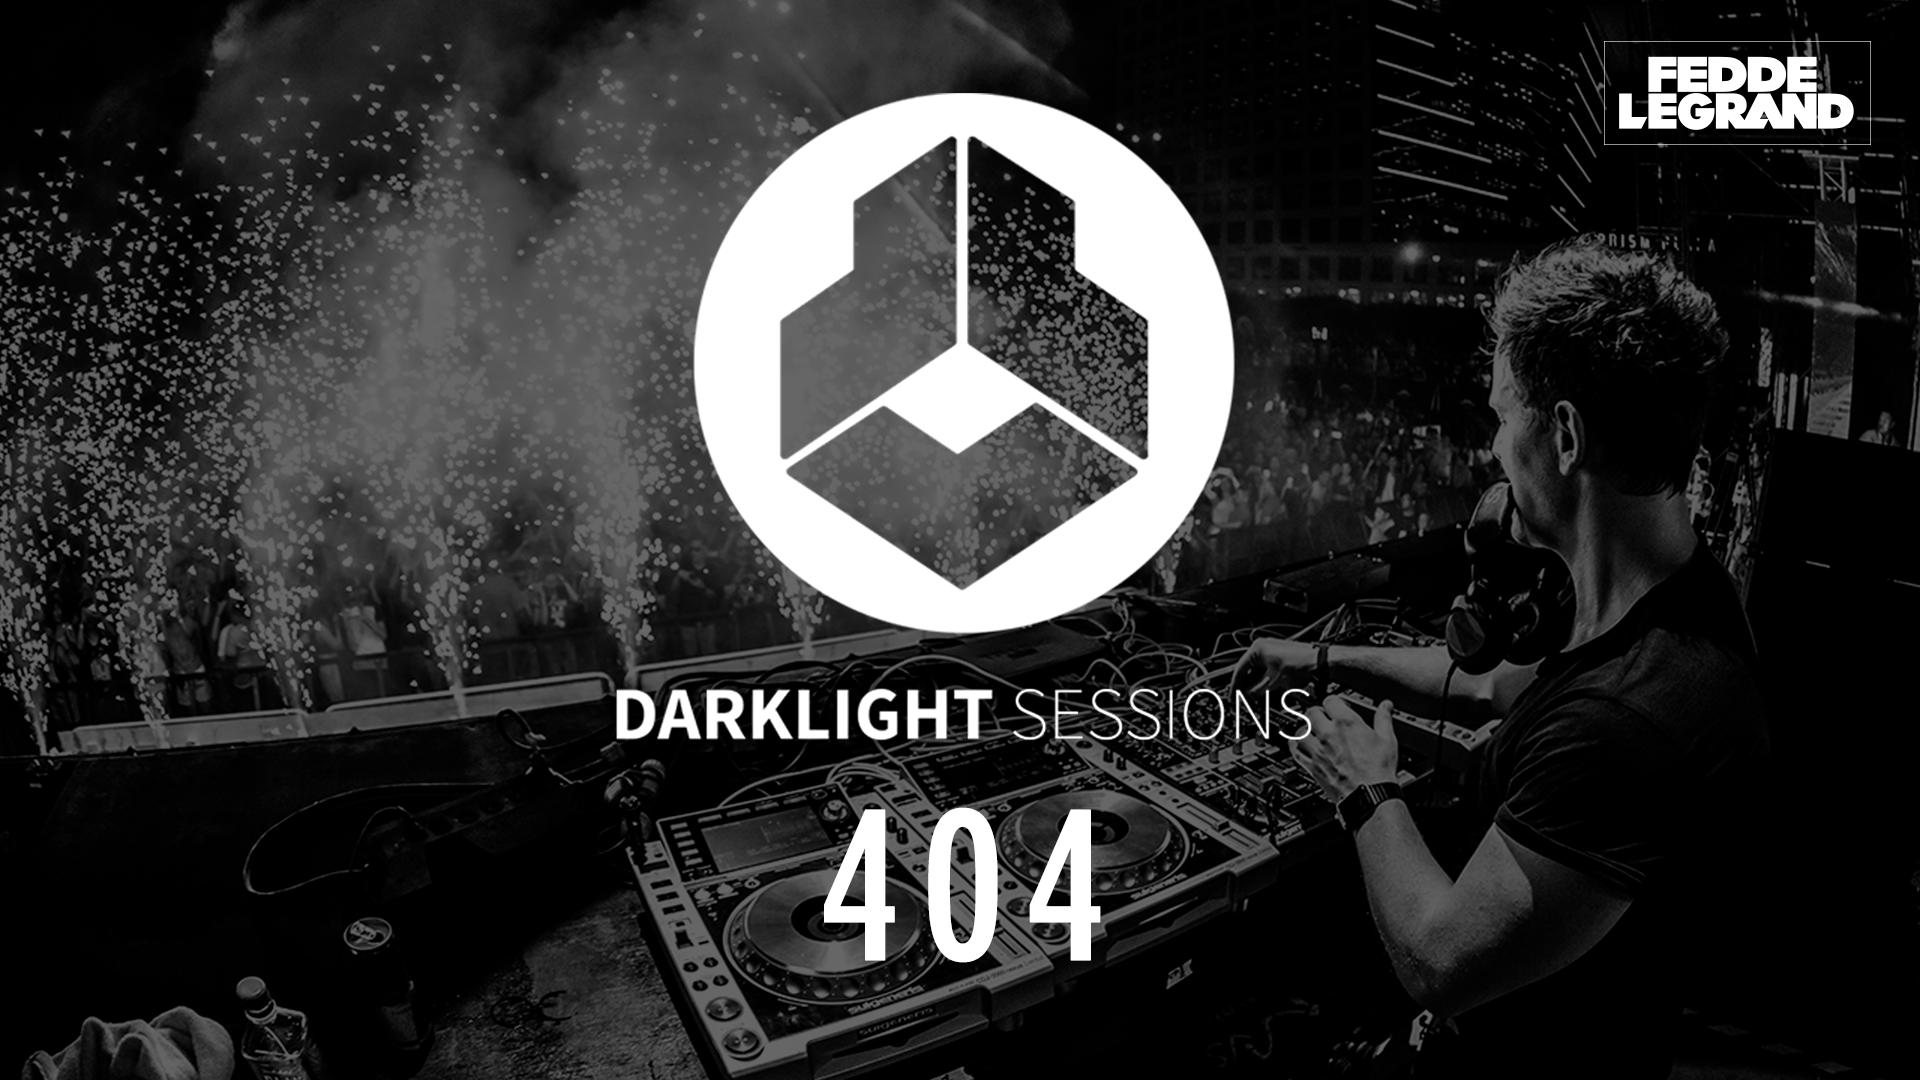 Darklight Sessions 404